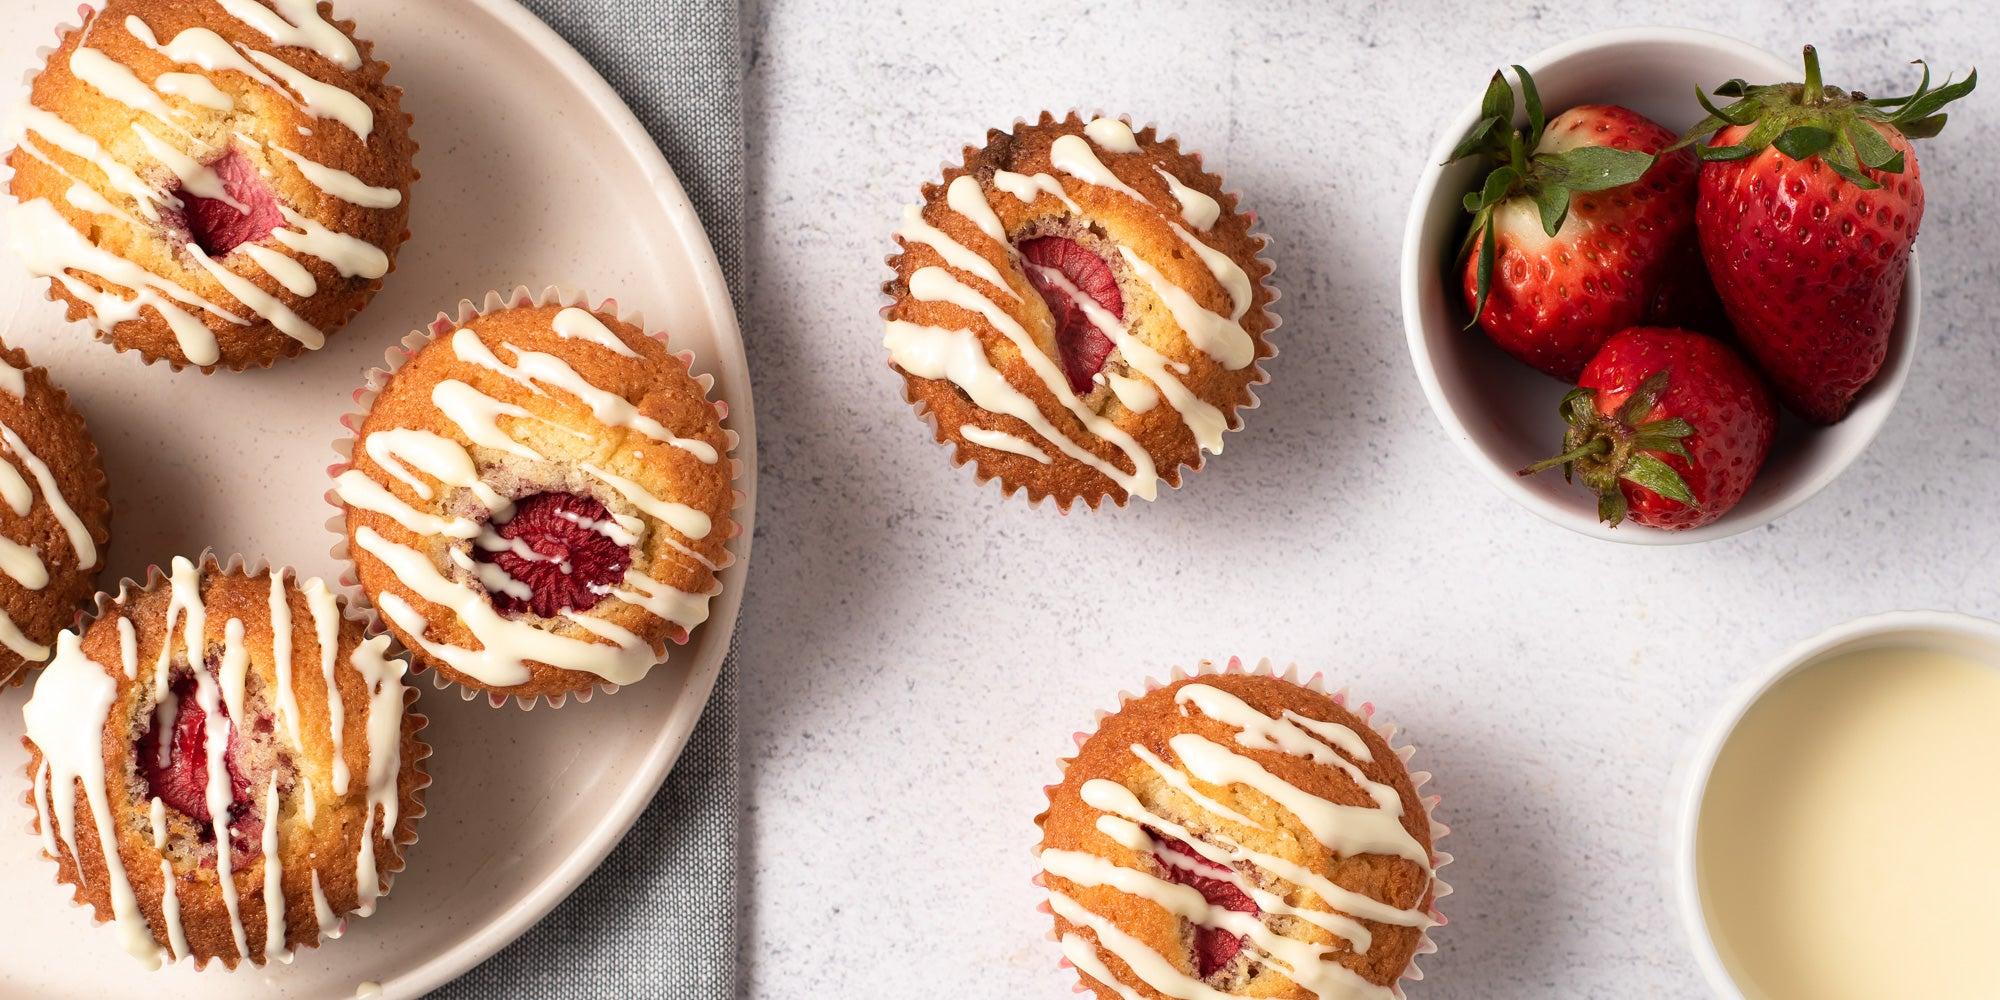 Strawberry Centre Muffins